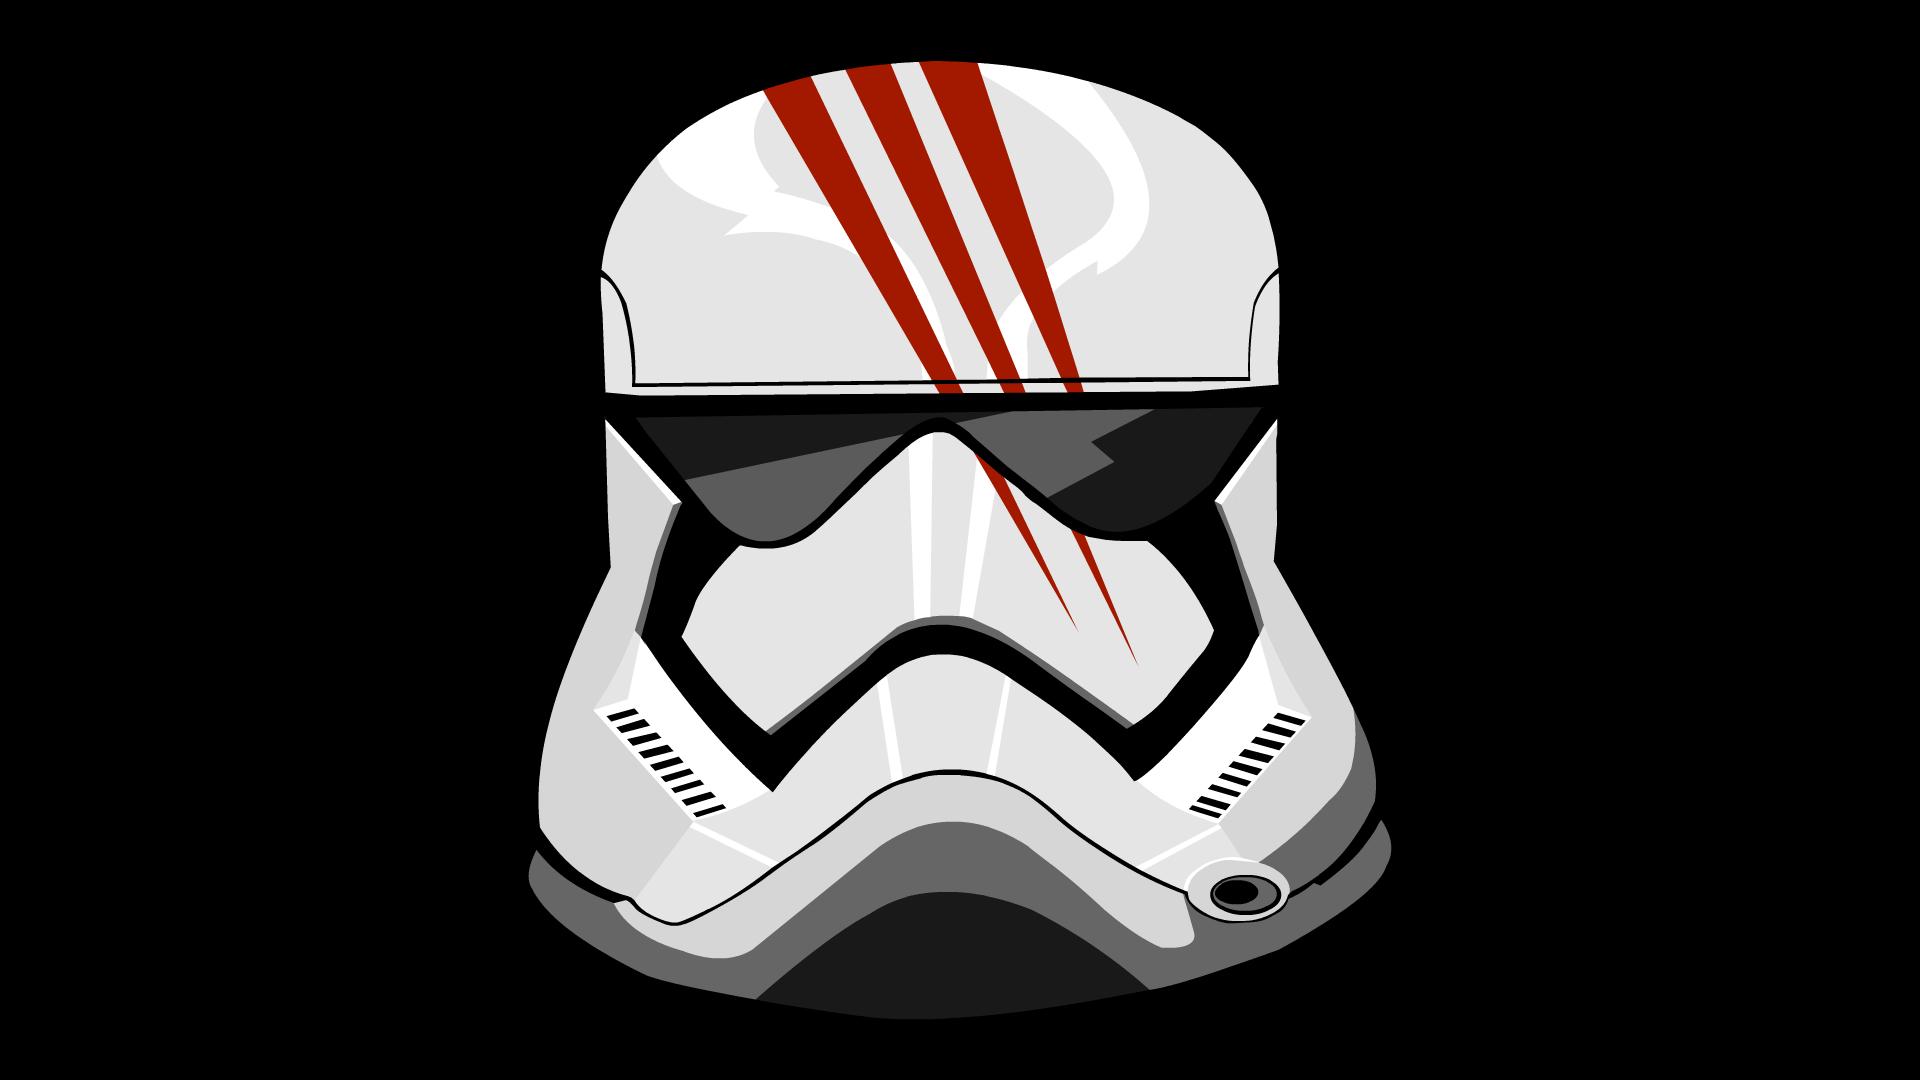 Star Wars Episode VII The Force Awakens Wallpaper 076